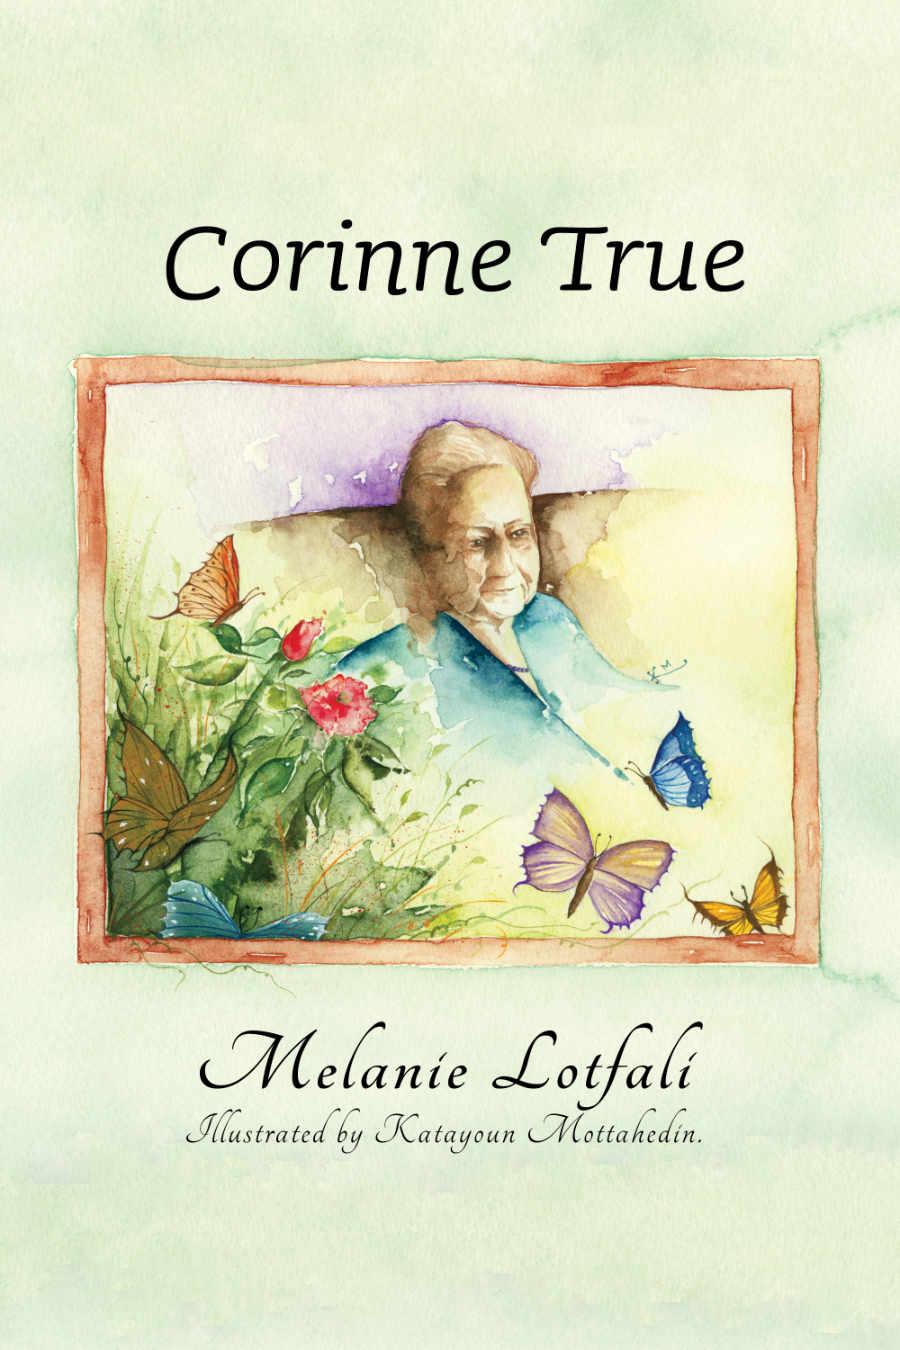 Corinne True